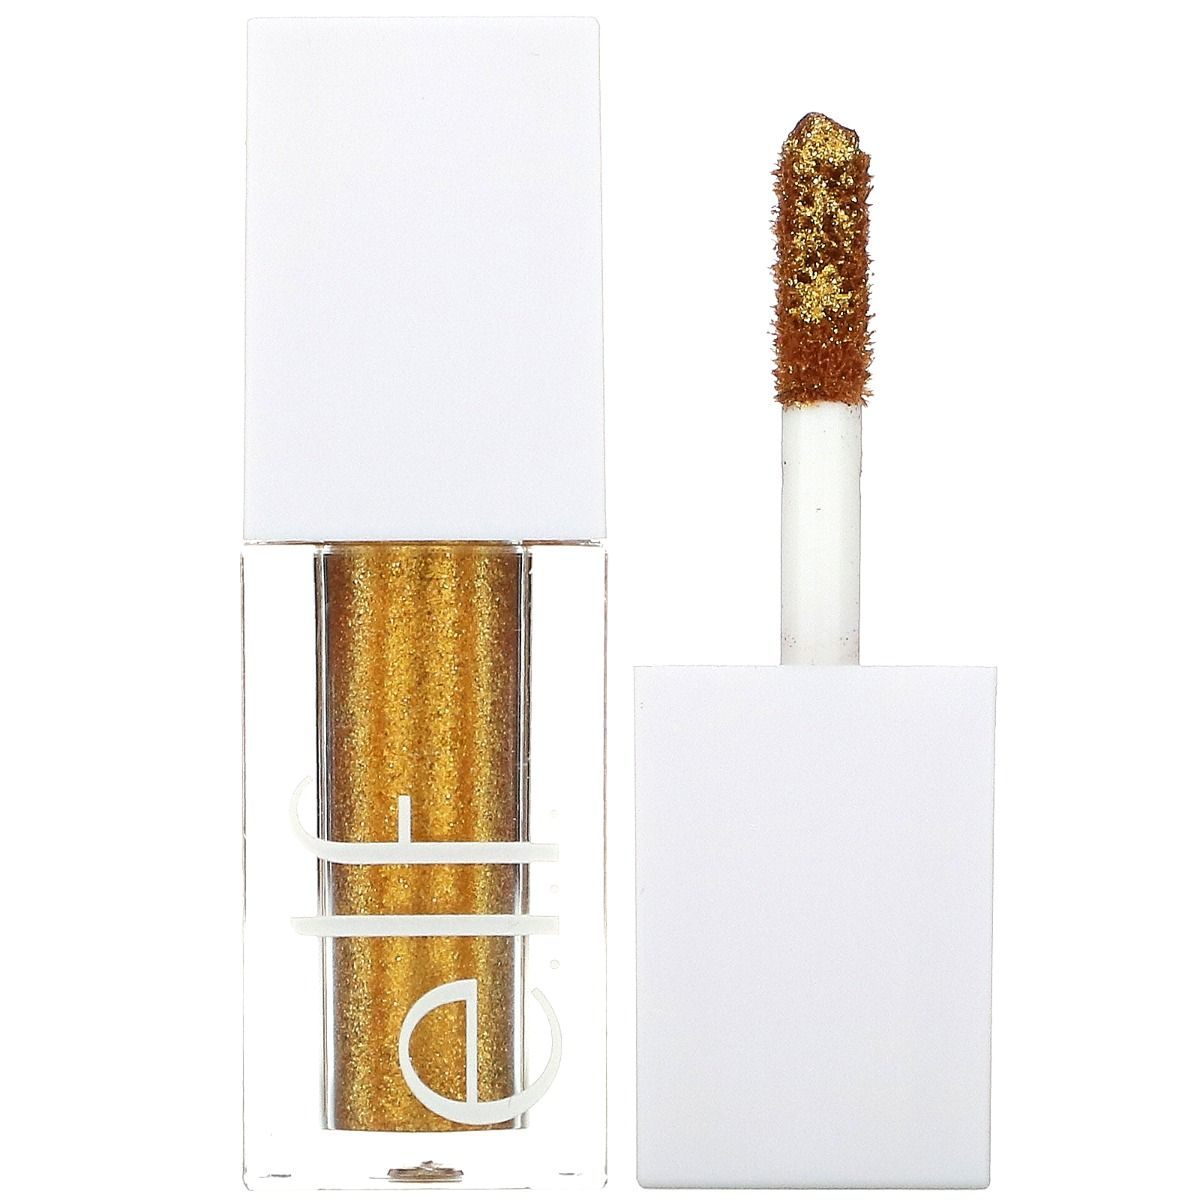 e.l.f. Glitter Melt Liquid Eyeshadow 24K Gold 3ml